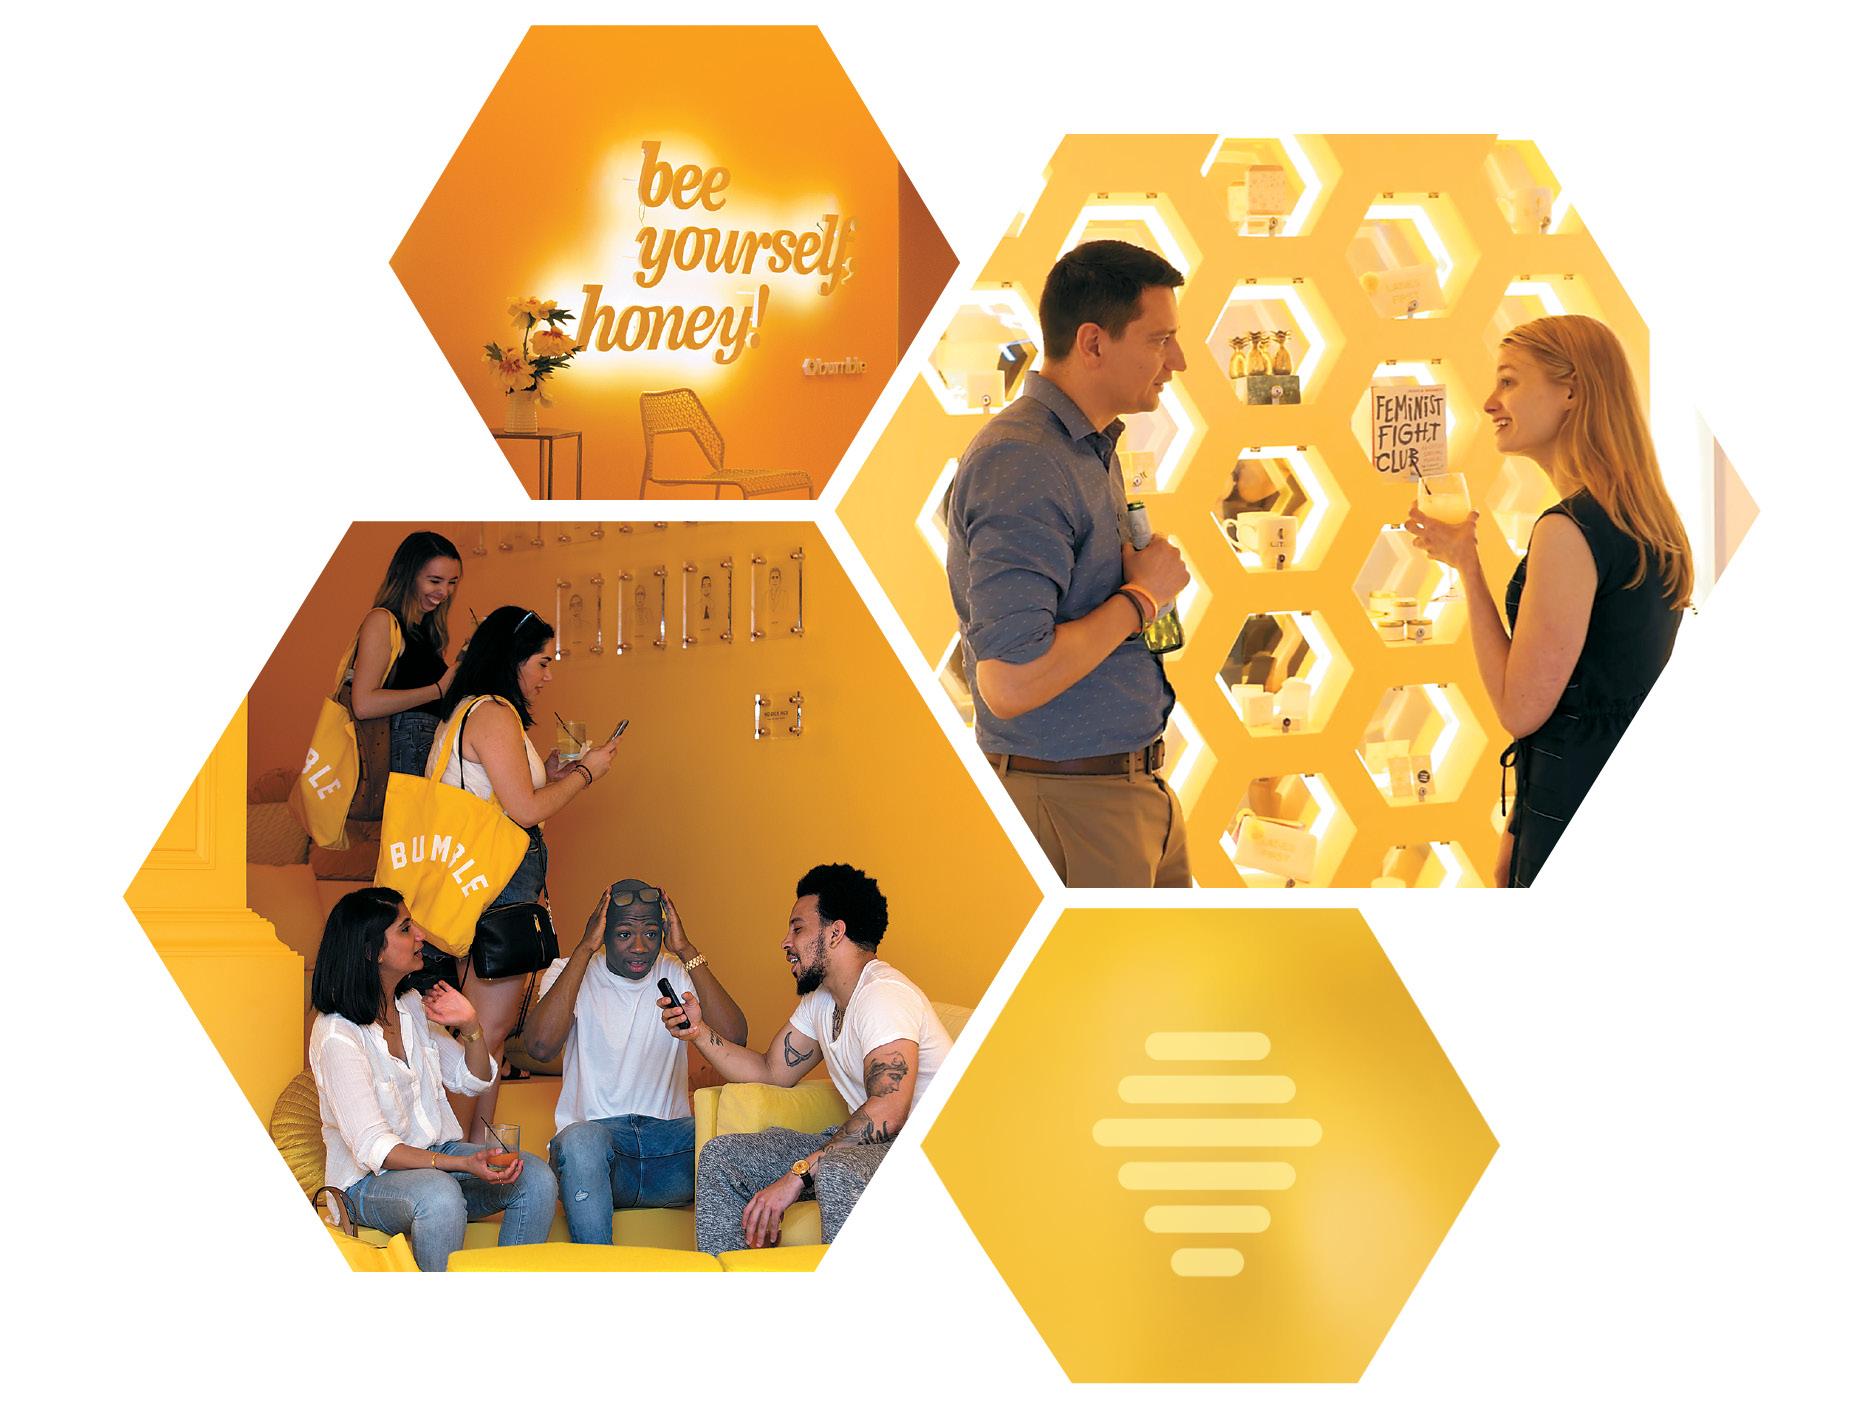 Buzz-Worthy Marketing - EXHIBITOR magazine